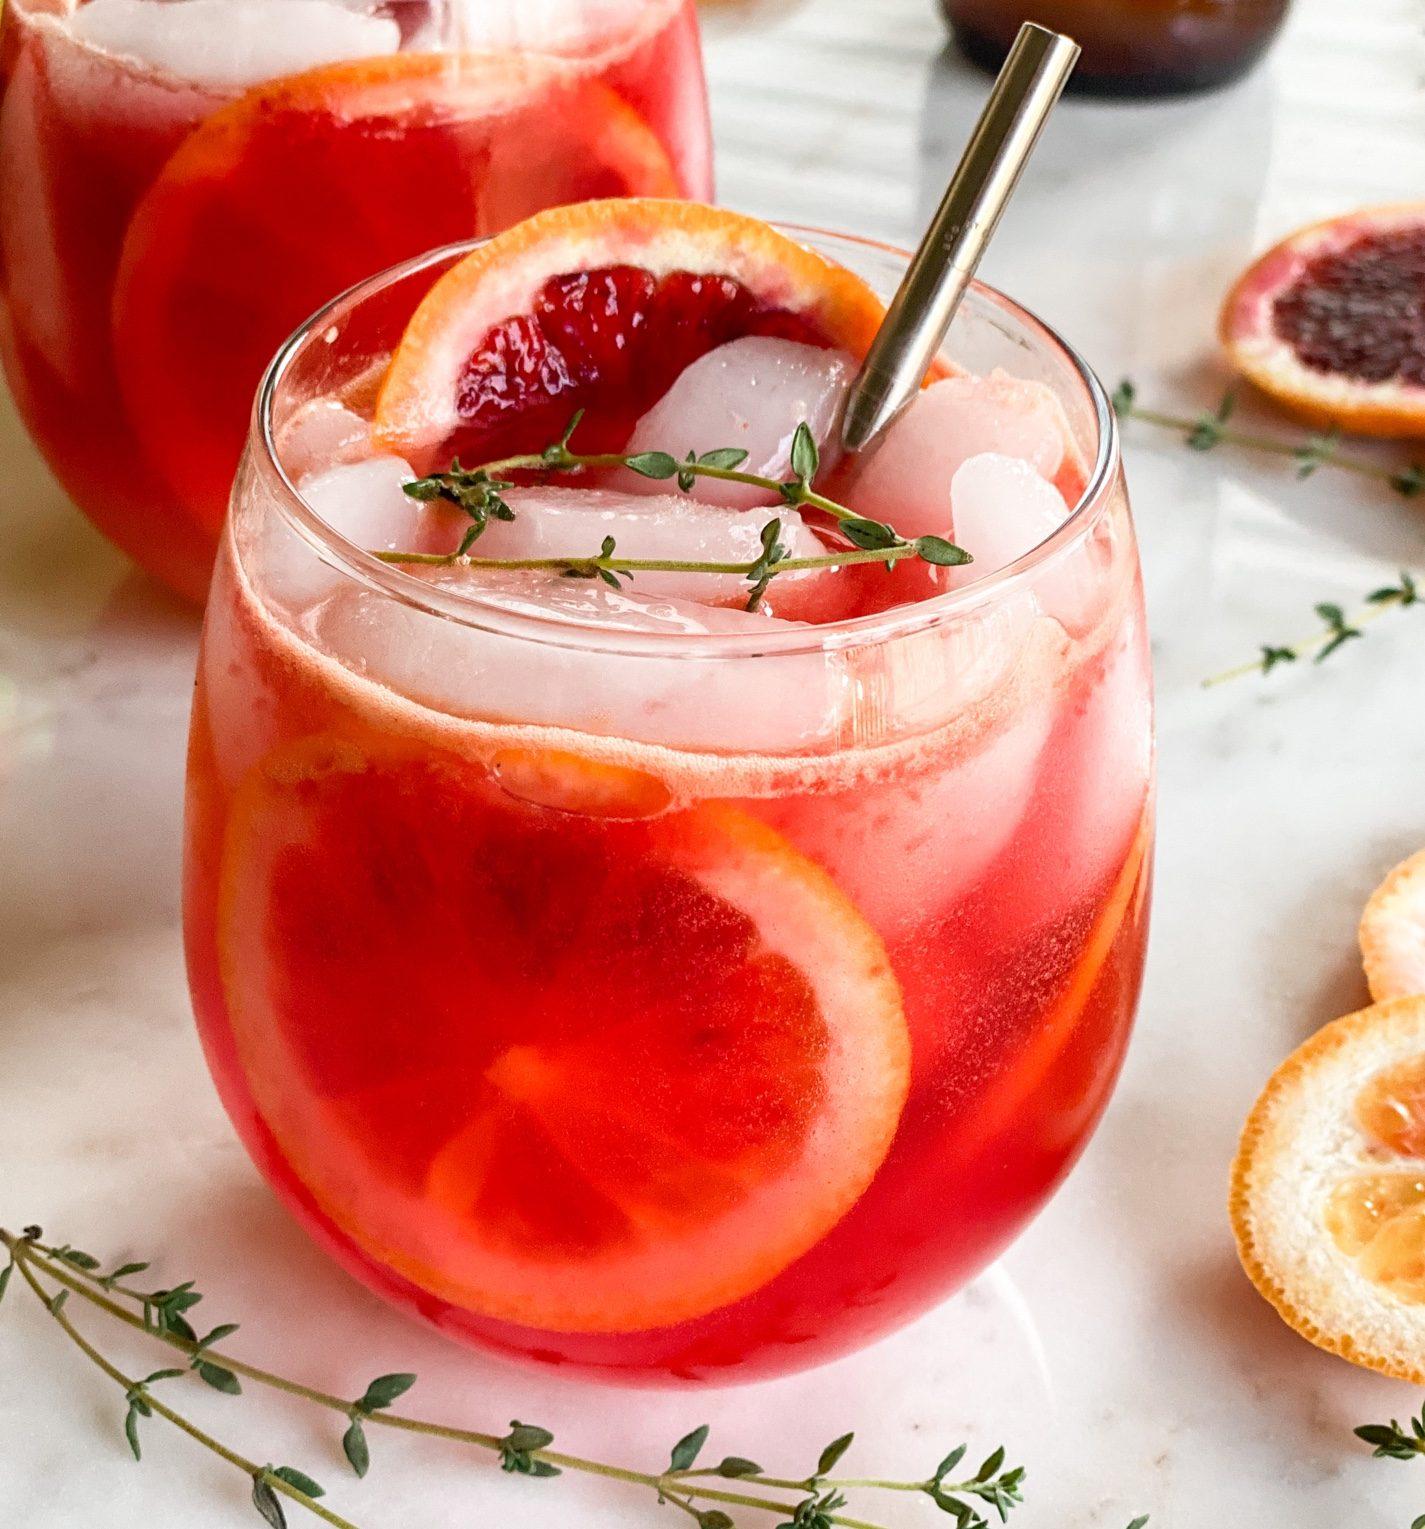 It's Thyme for Blood Orange Cocktail Season!!